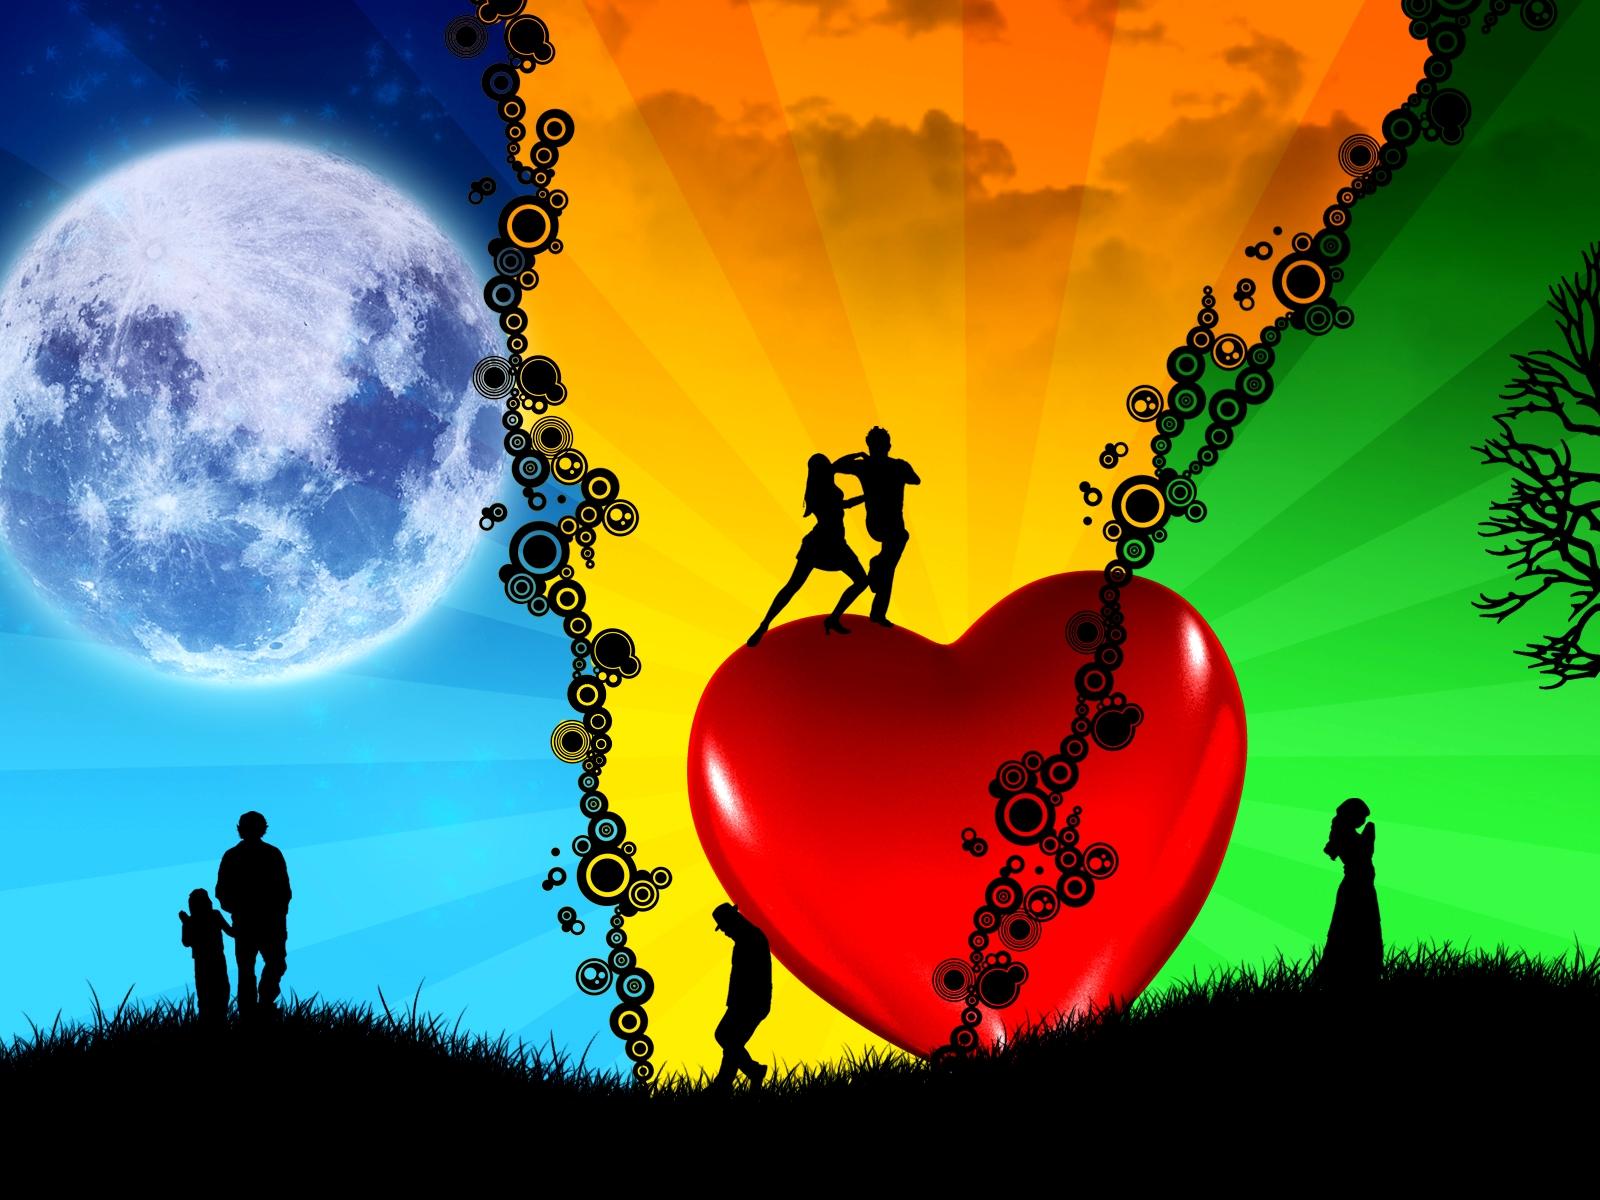 beautiful love wallpaper for mobile